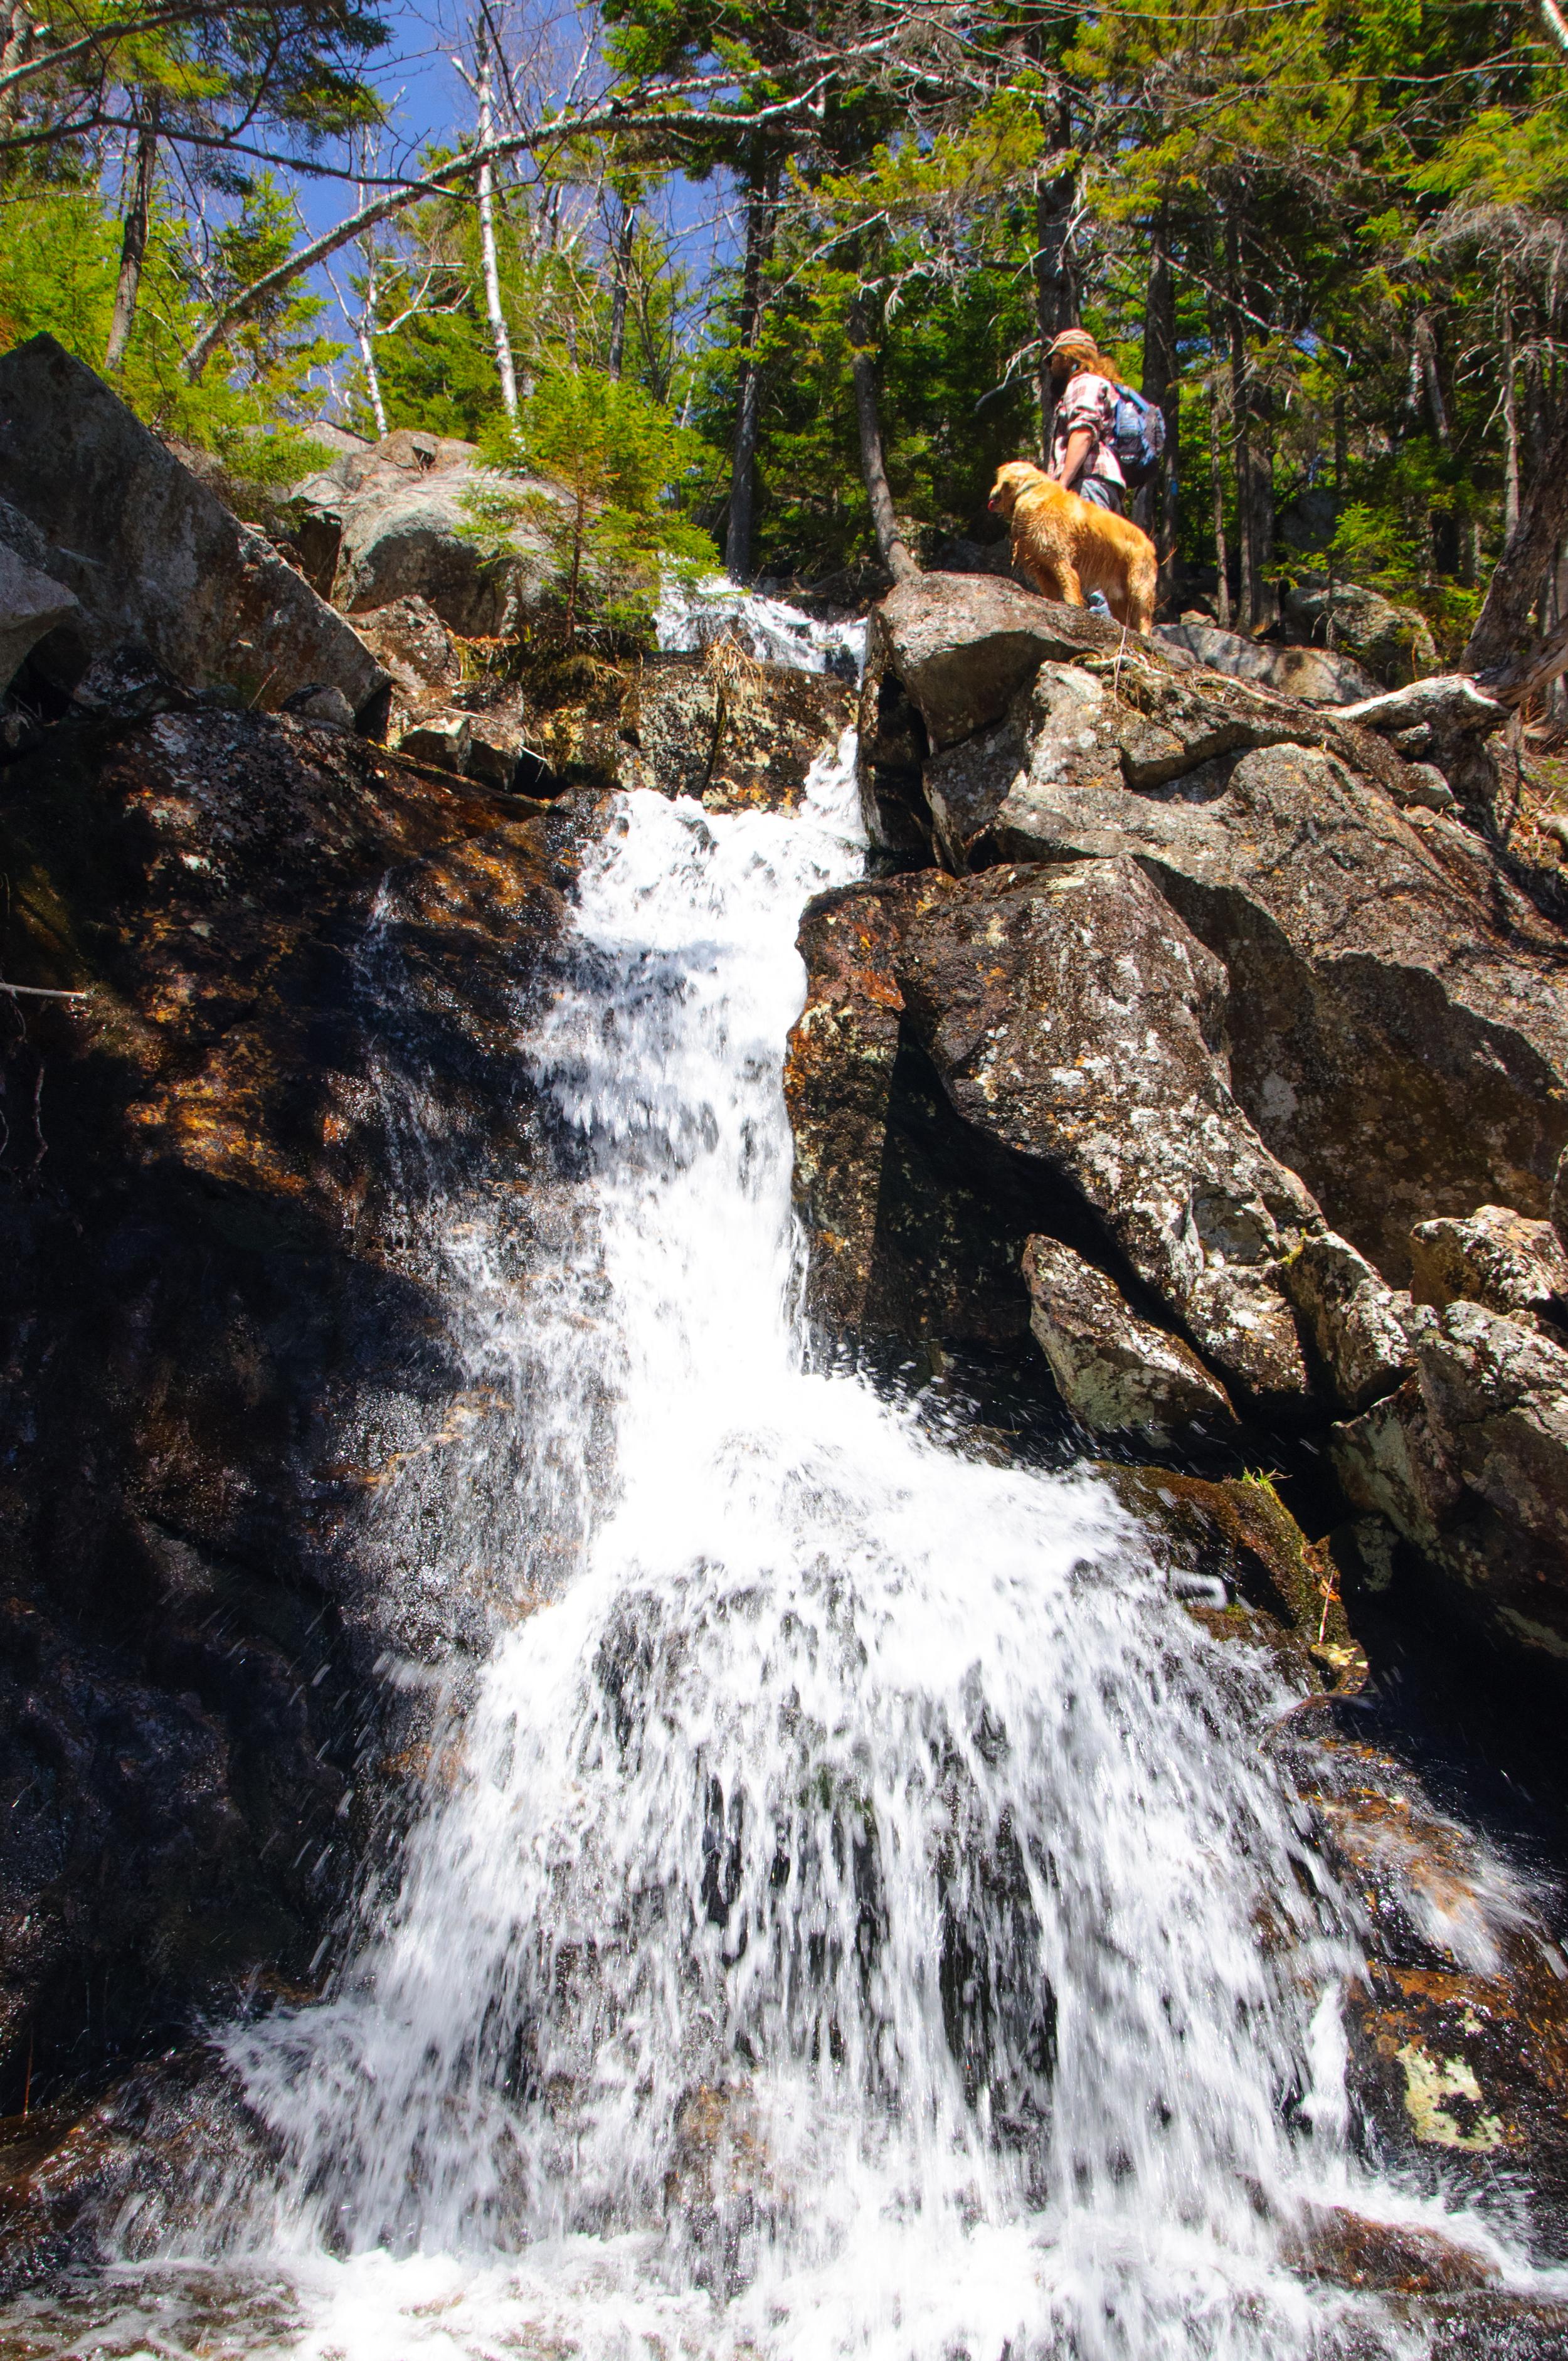 Tumbledown Mountain, Maine, USA May 2015